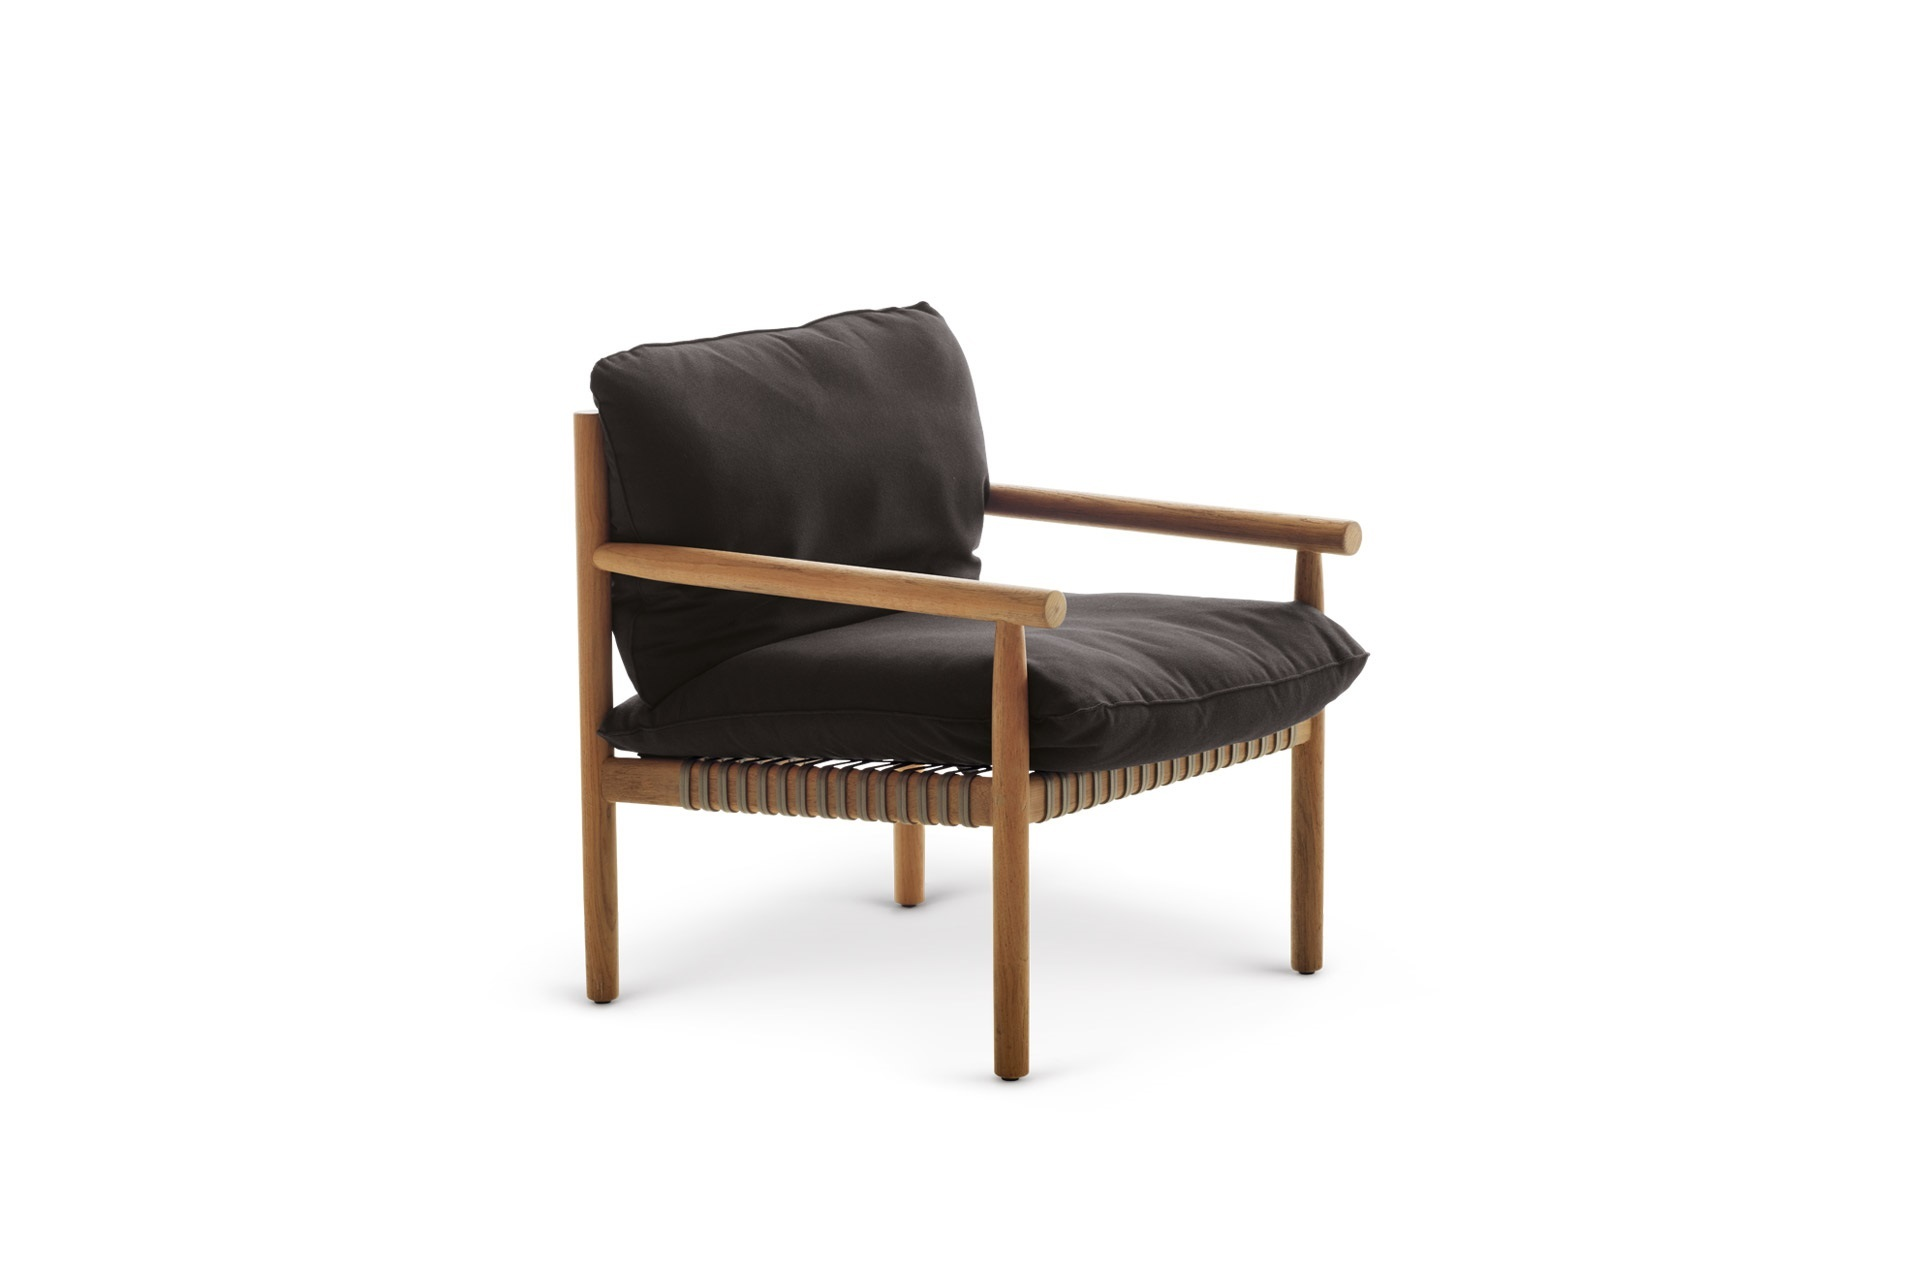 Fine Tibbo Lounge Chair By Dedon Stylepark Machost Co Dining Chair Design Ideas Machostcouk